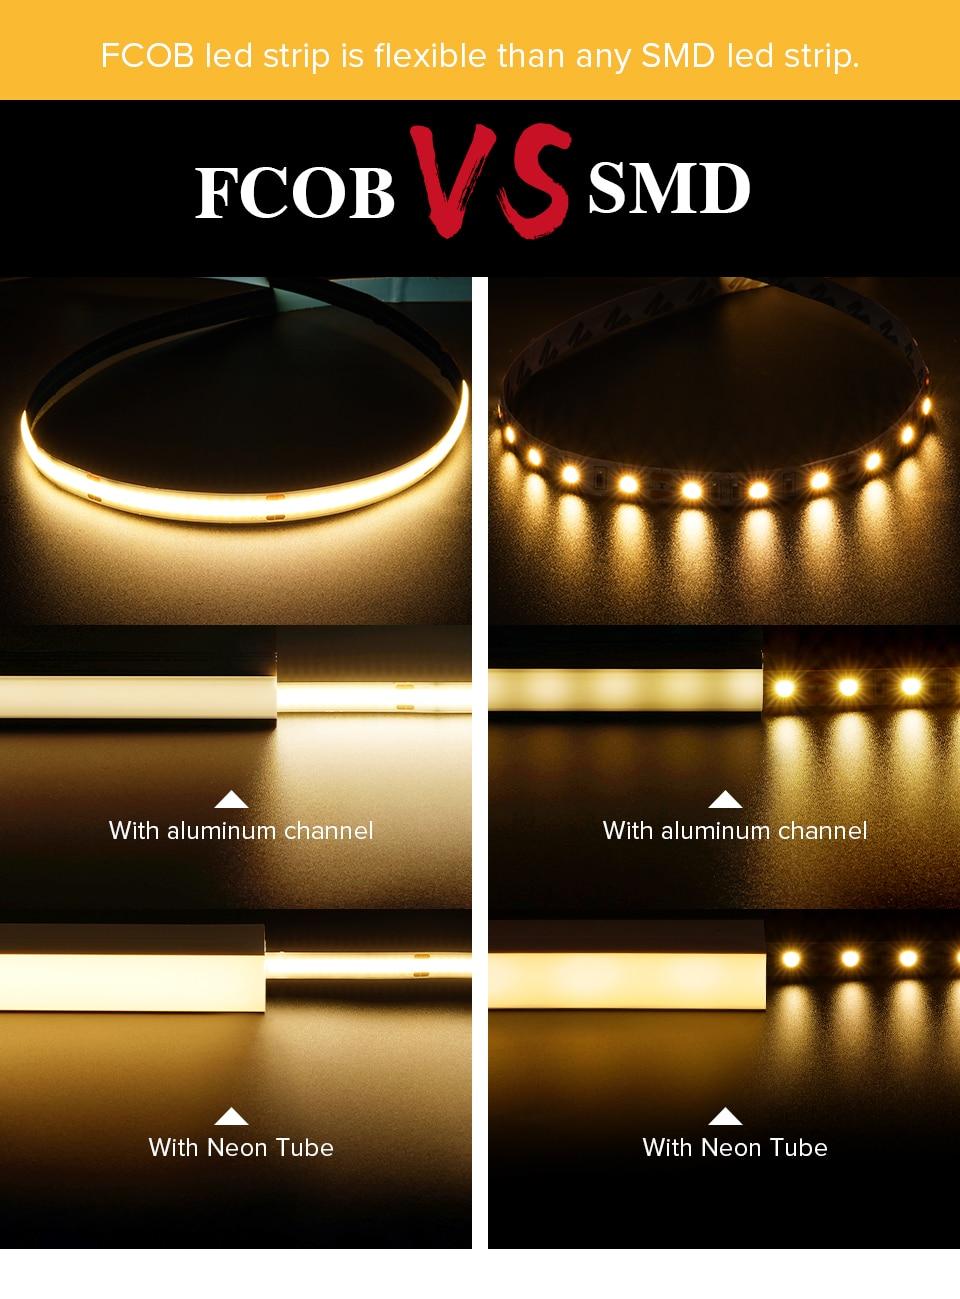 FCOB Led Lights for Bedroom RF14 Keys Dimmable Full Set High Density Room FOB COB Led Light Strips Warm Nature Cool White DC24V